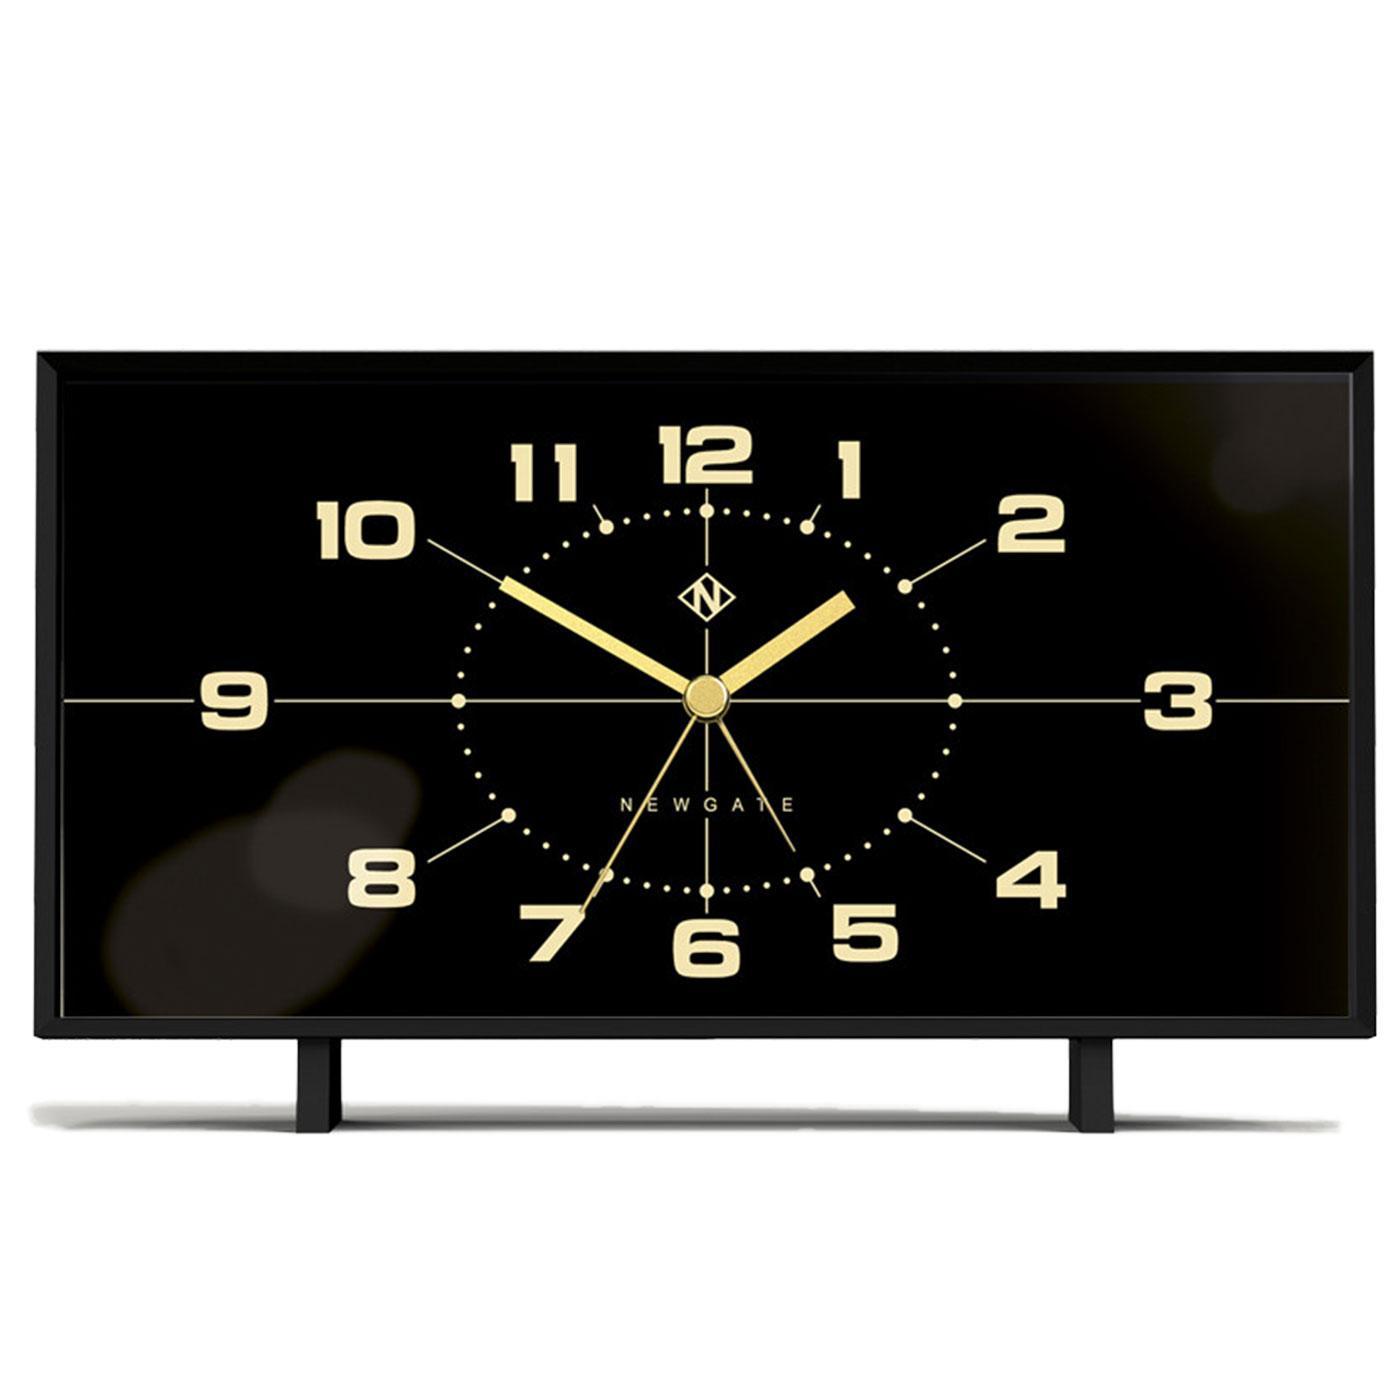 Wideboy NEWGATE CLOCKS Retro 50s Alarm Clock BB